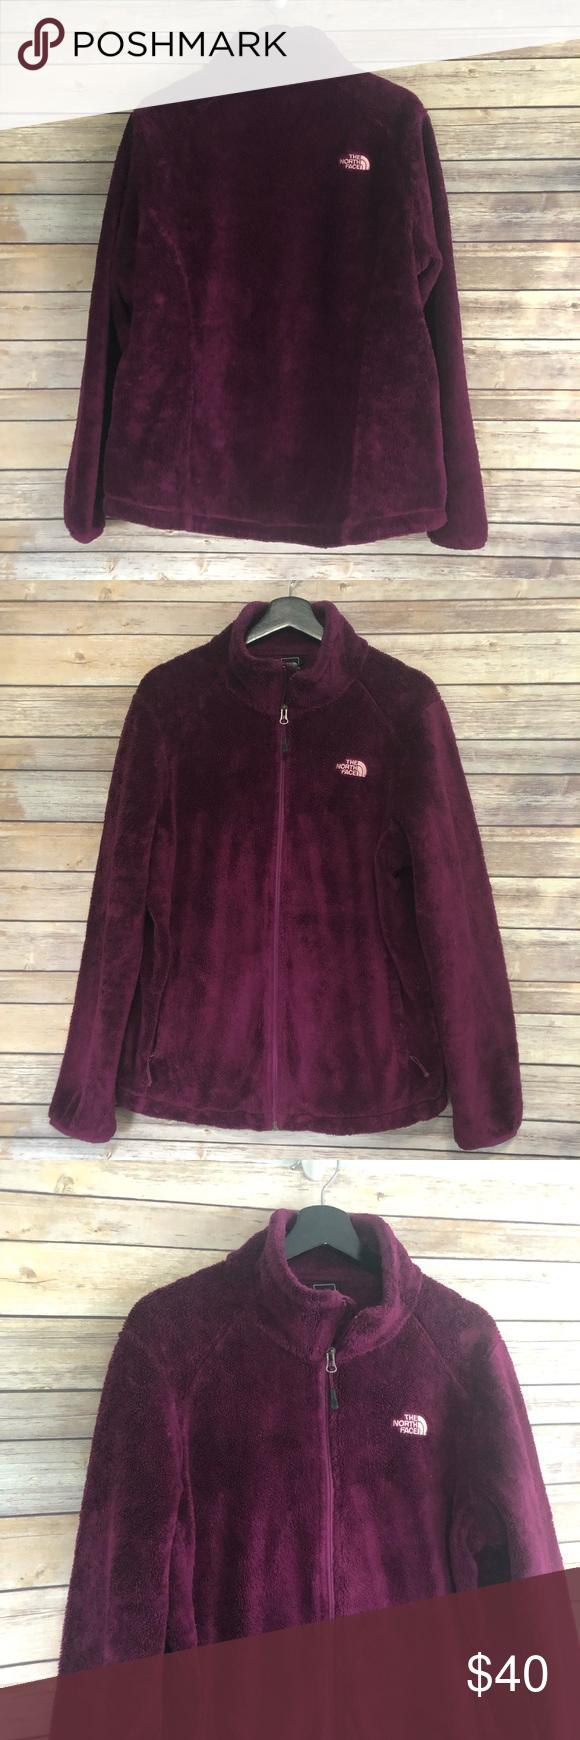 Maroon Purple North Face Fleece Jacket North Face Fleece Jacket North Face Fleece Fleece Jacket [ 1740 x 580 Pixel ]